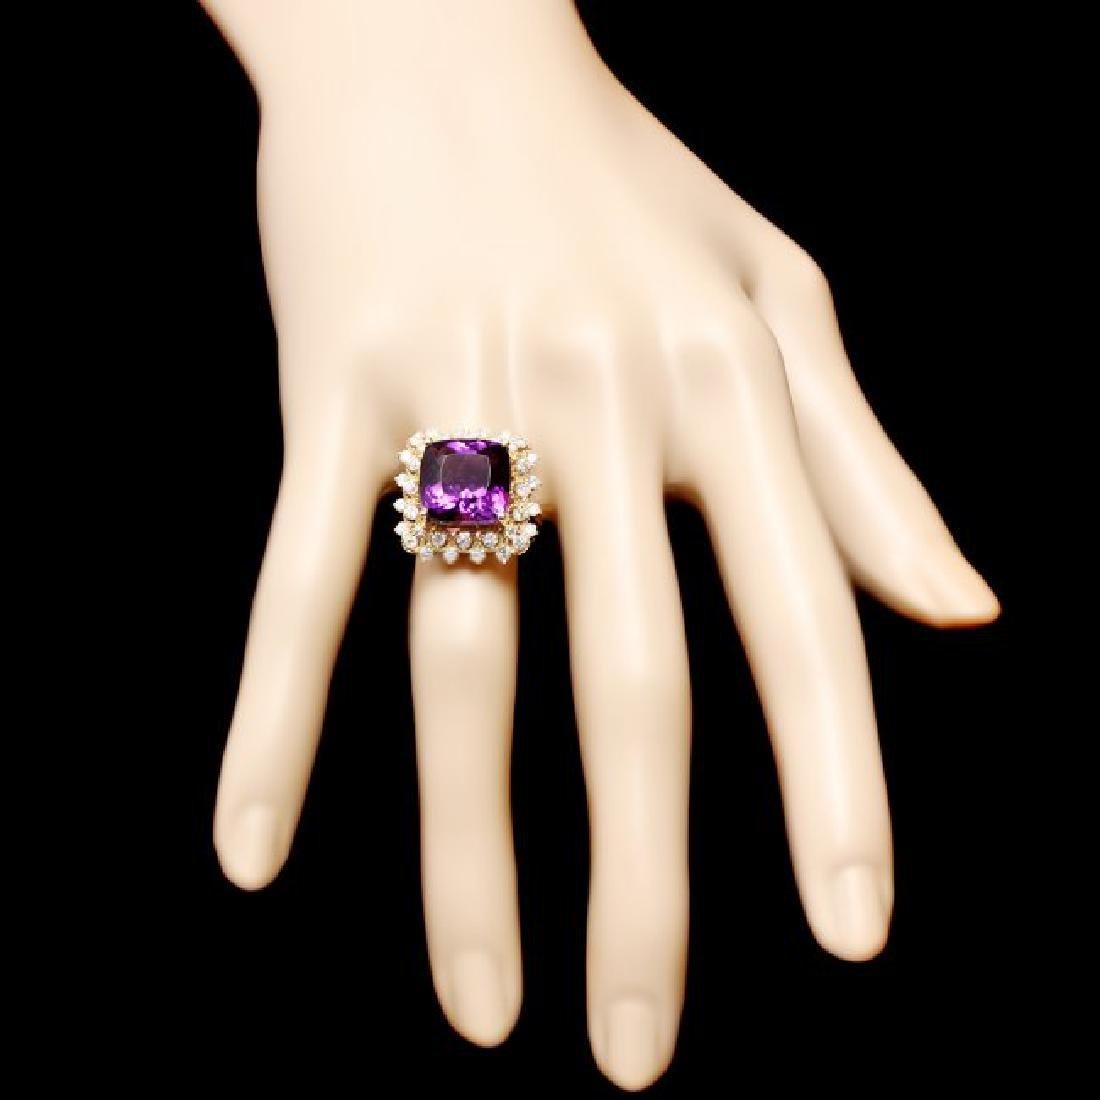 14k Gold 7.30ct Amethyst 1.00ct Diamond Ring - 4